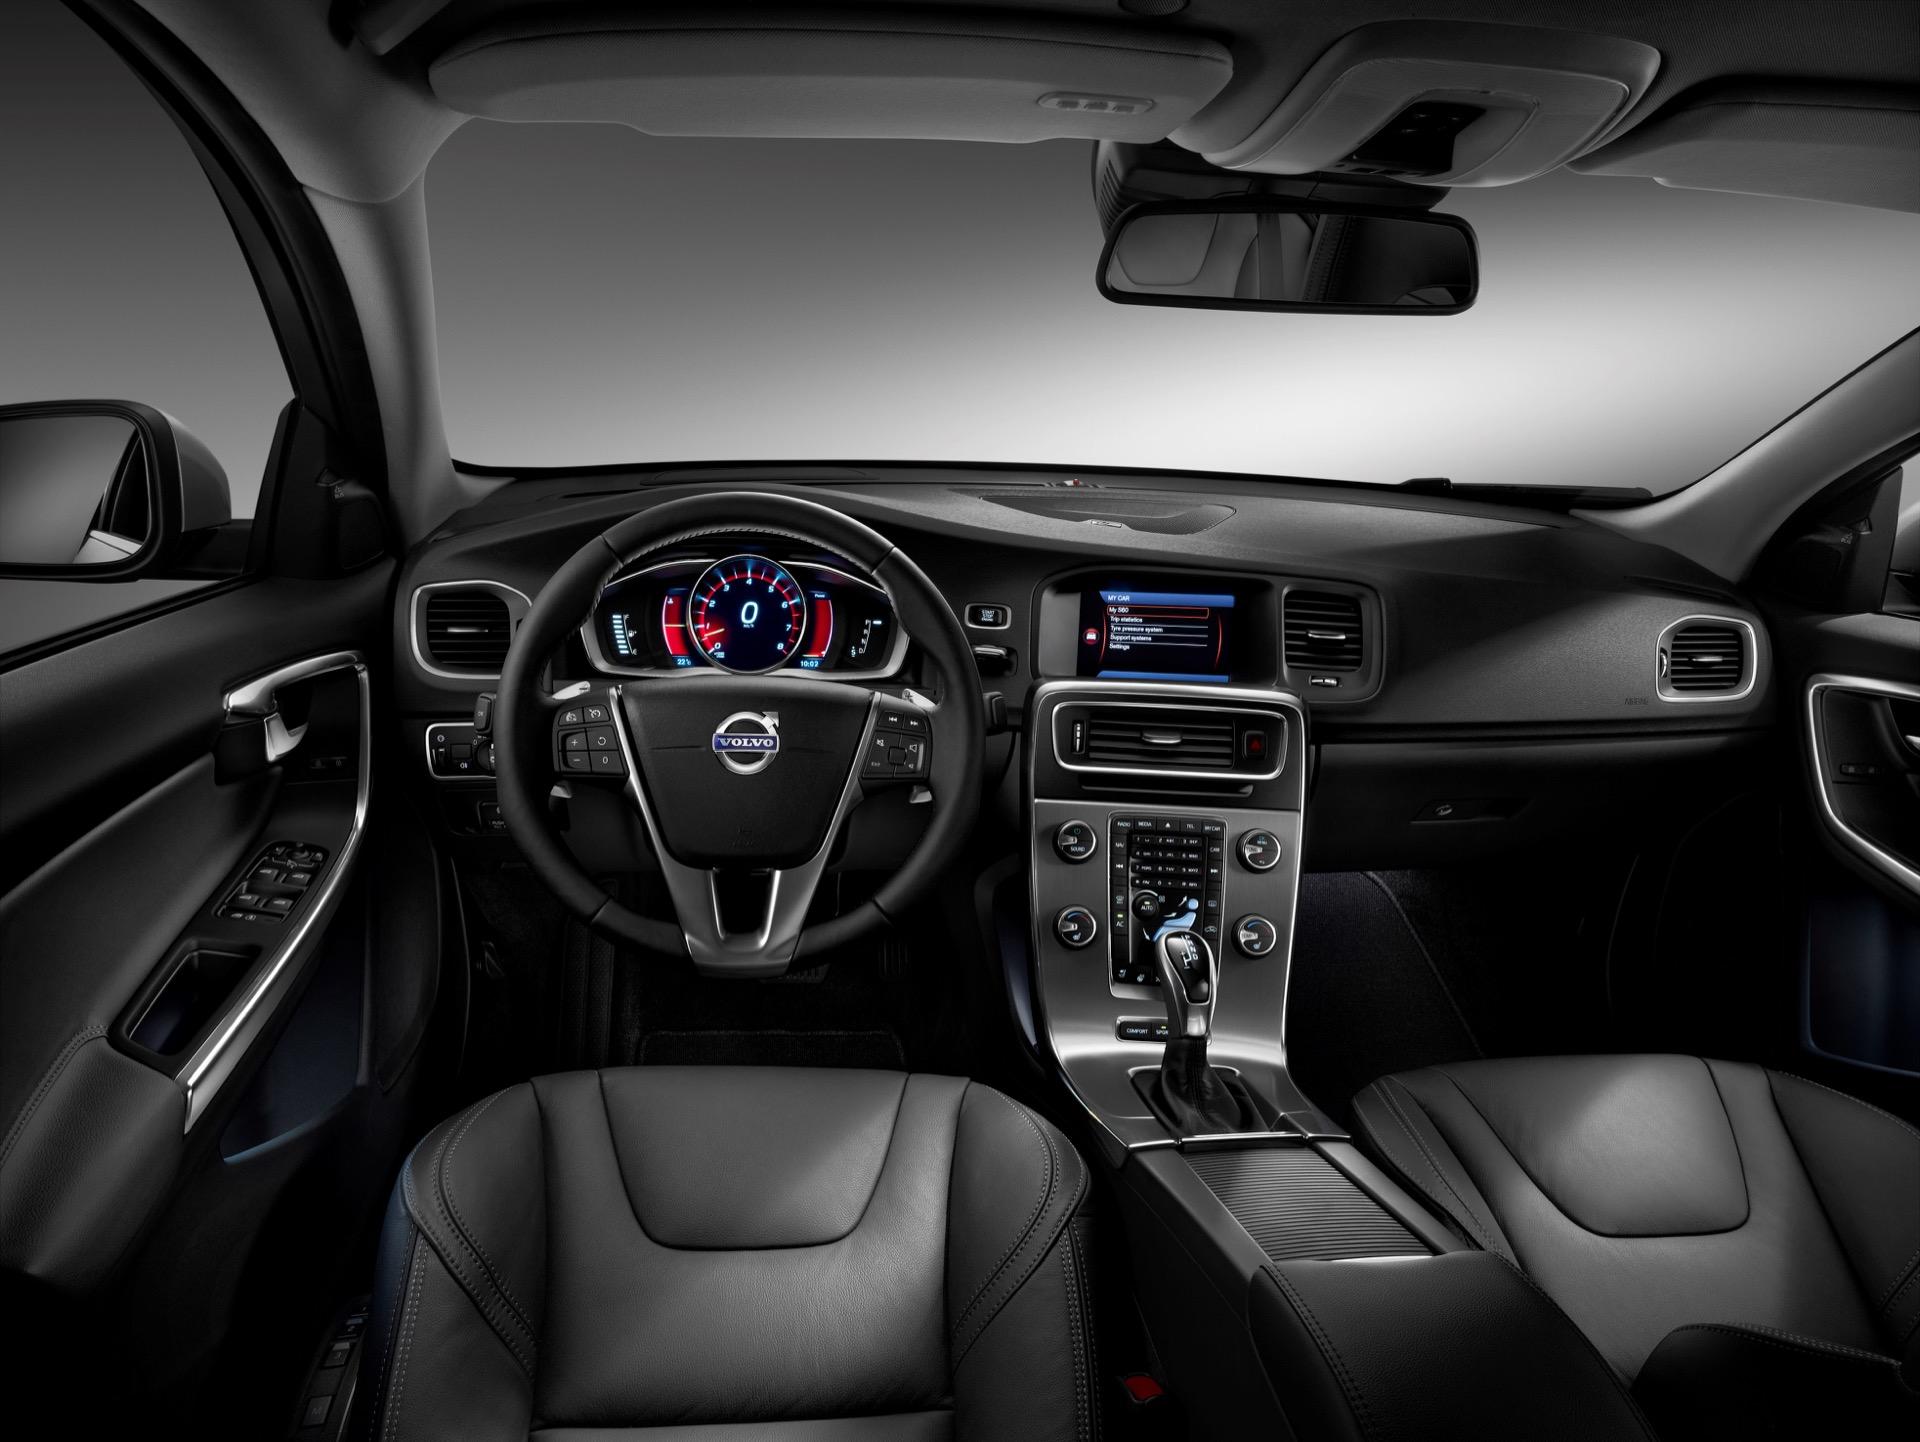 Volvo S60 -  2013, 2014, Images, Interior, S60, Volvo